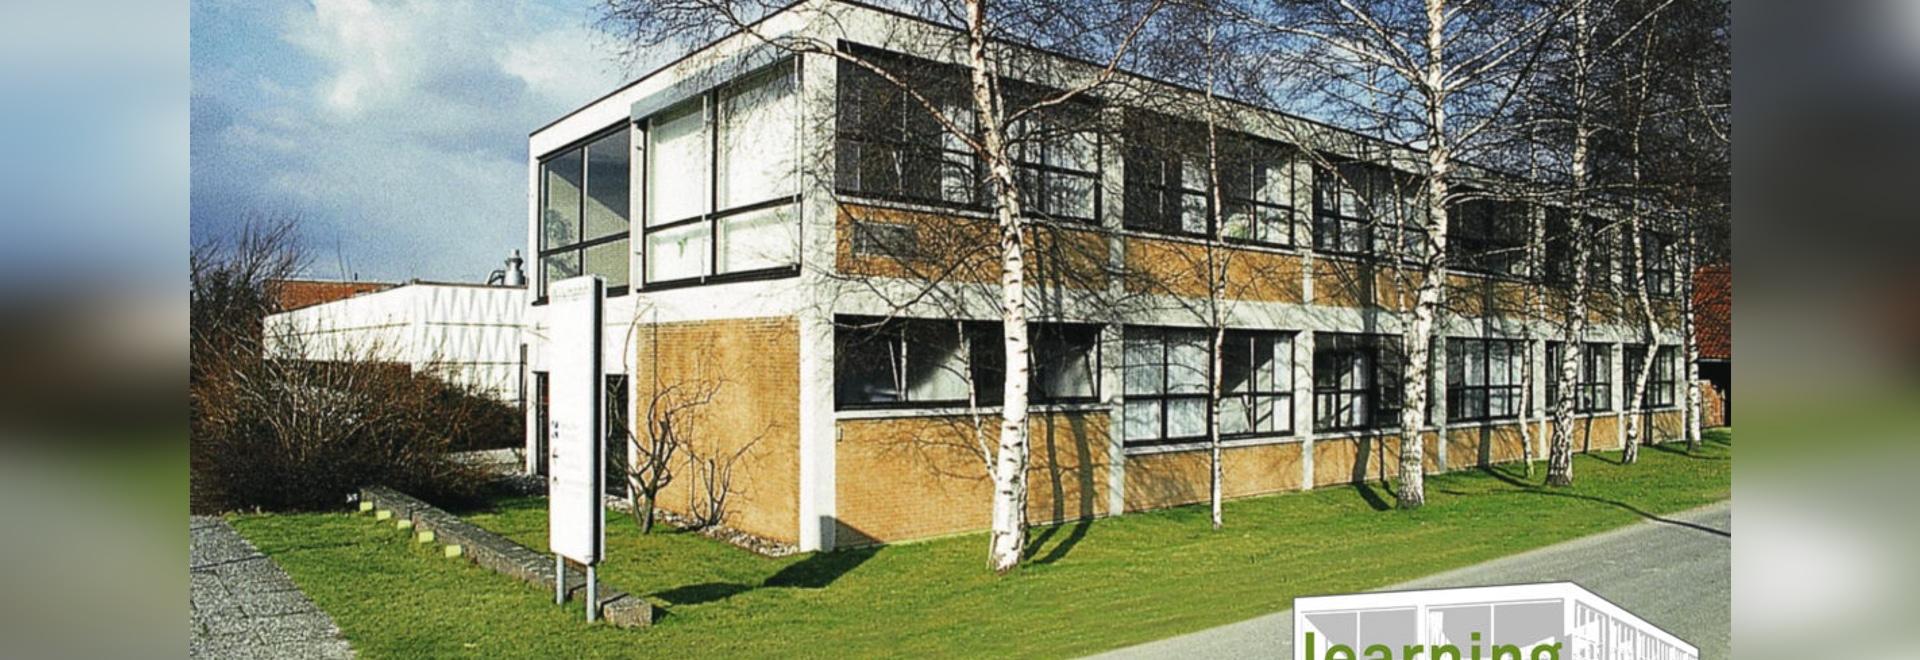 The Wilkhahn management building